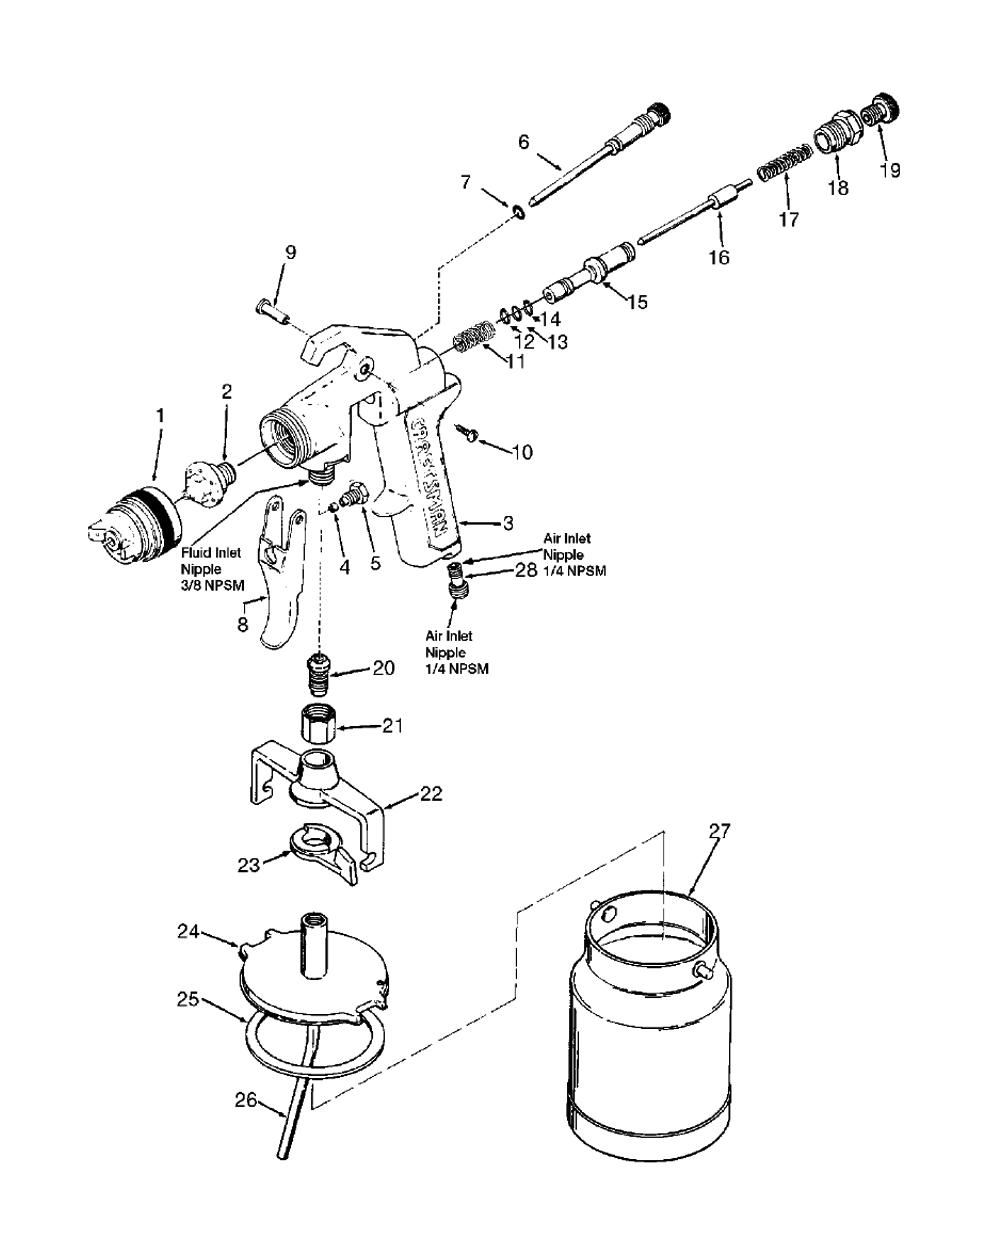 devilbiss spray gun parts diagram liftmaster garagentor ffner buy asp500 type 1 replacement tool schematic